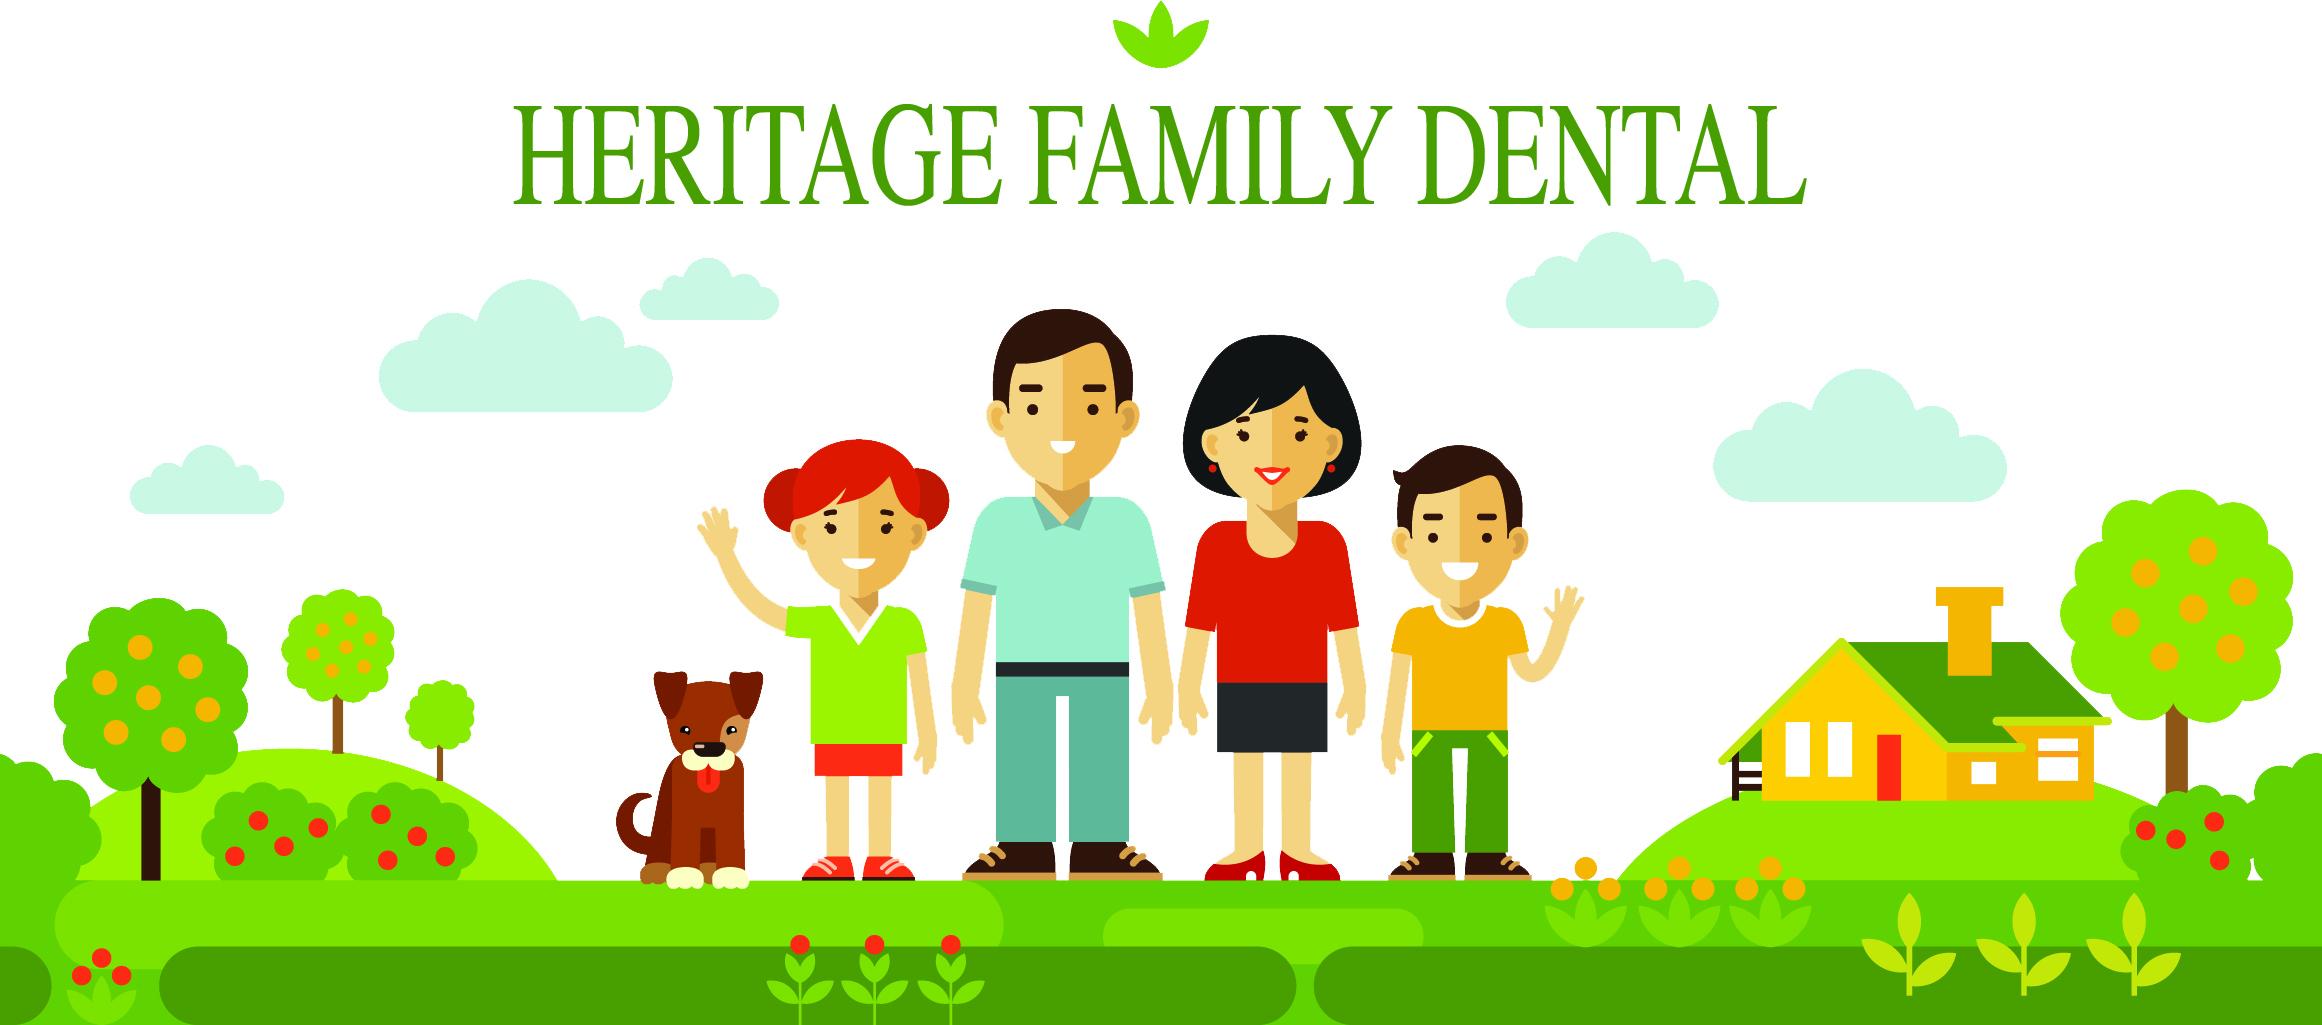 Heritage Family Dental